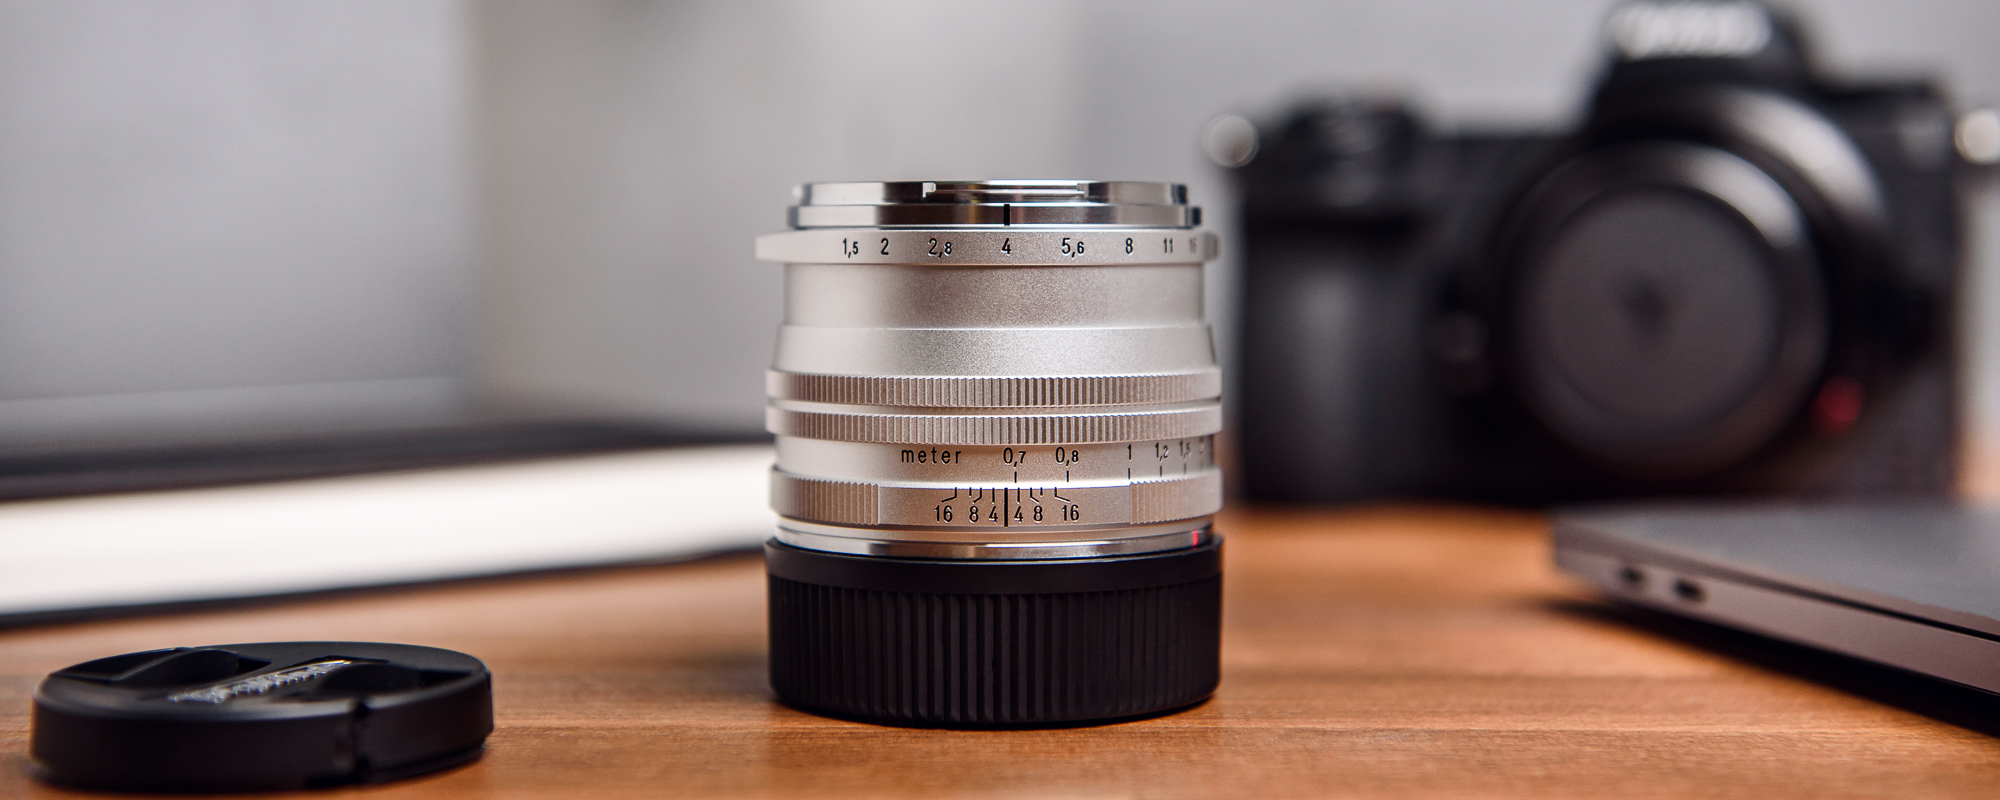 Voigtlander Nokton II 50 mm f/1.5 lens for Leica M - SC, silver - on desk